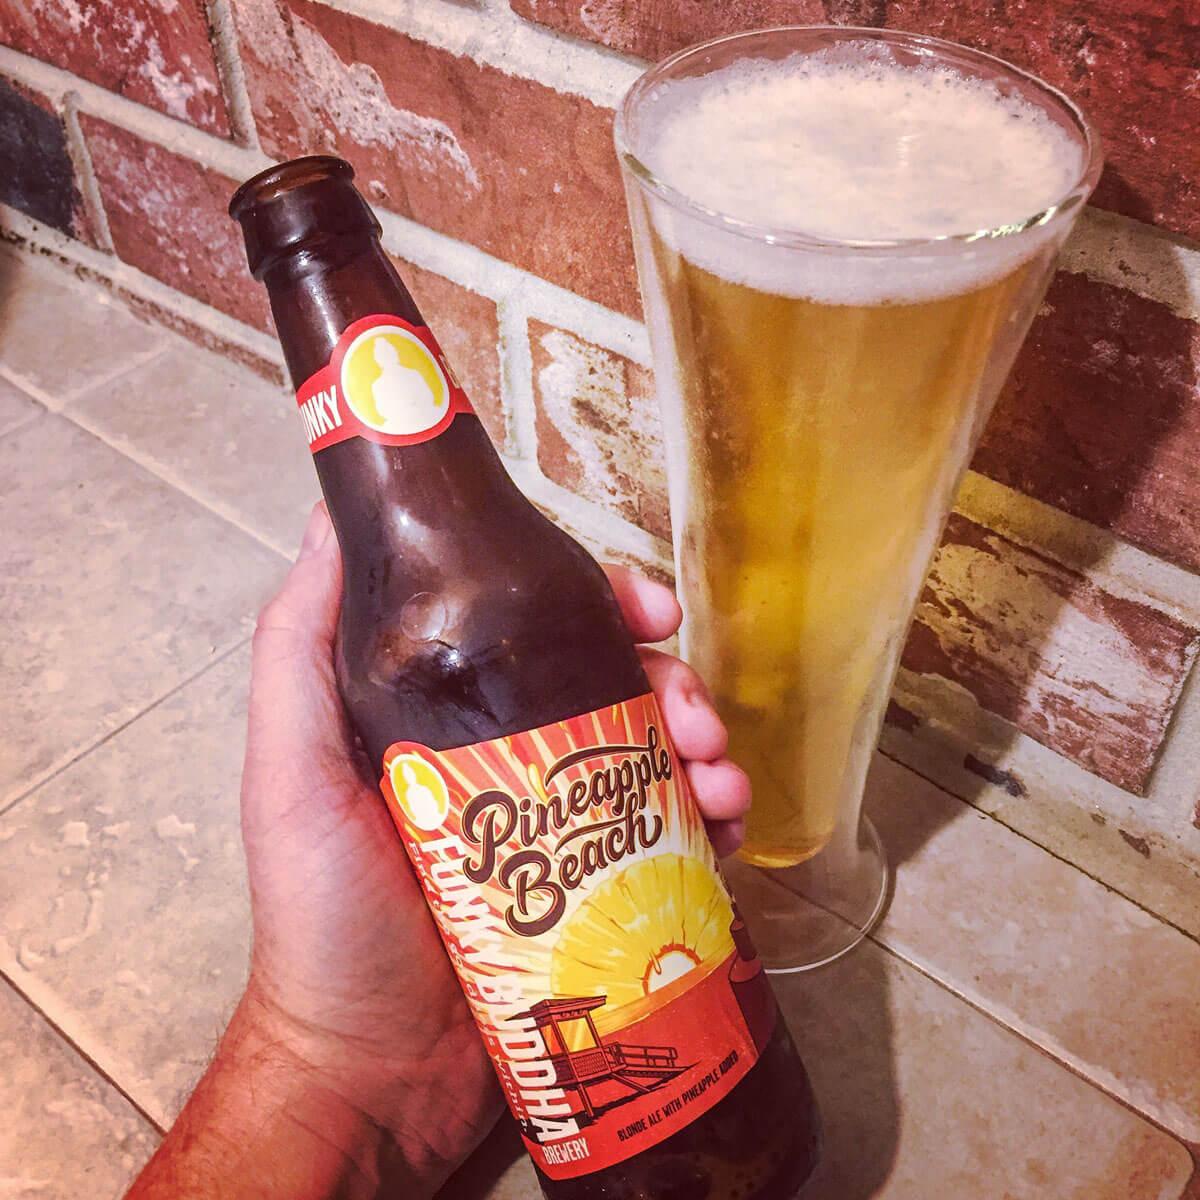 Pineapple Beach, an American Blonde Ale by Funky Buddha Brewery